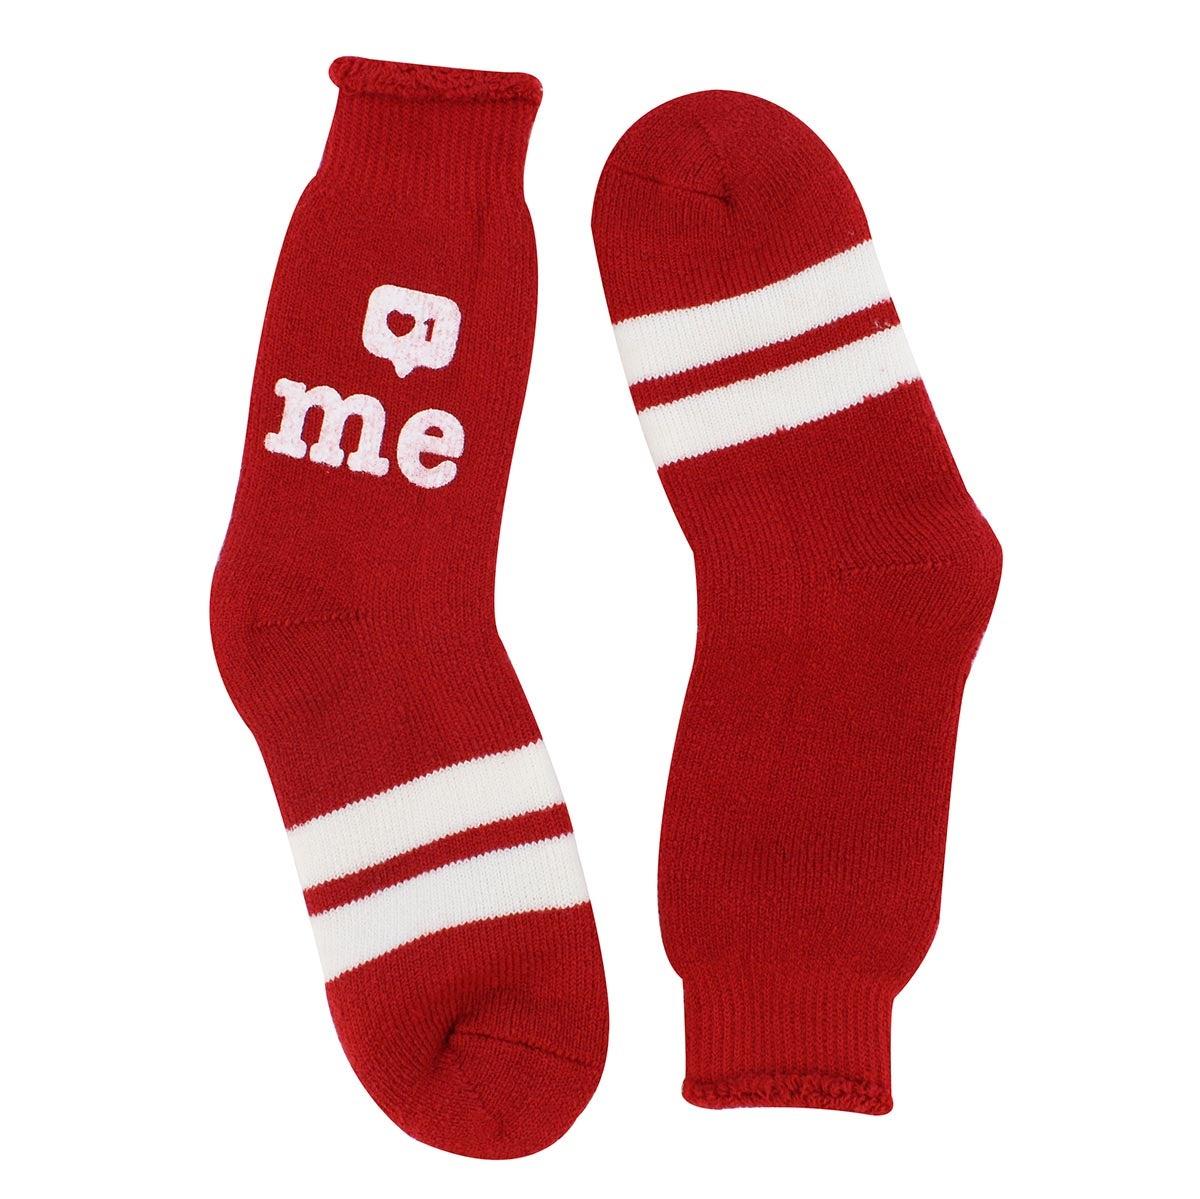 Women's Like Me red crew socks